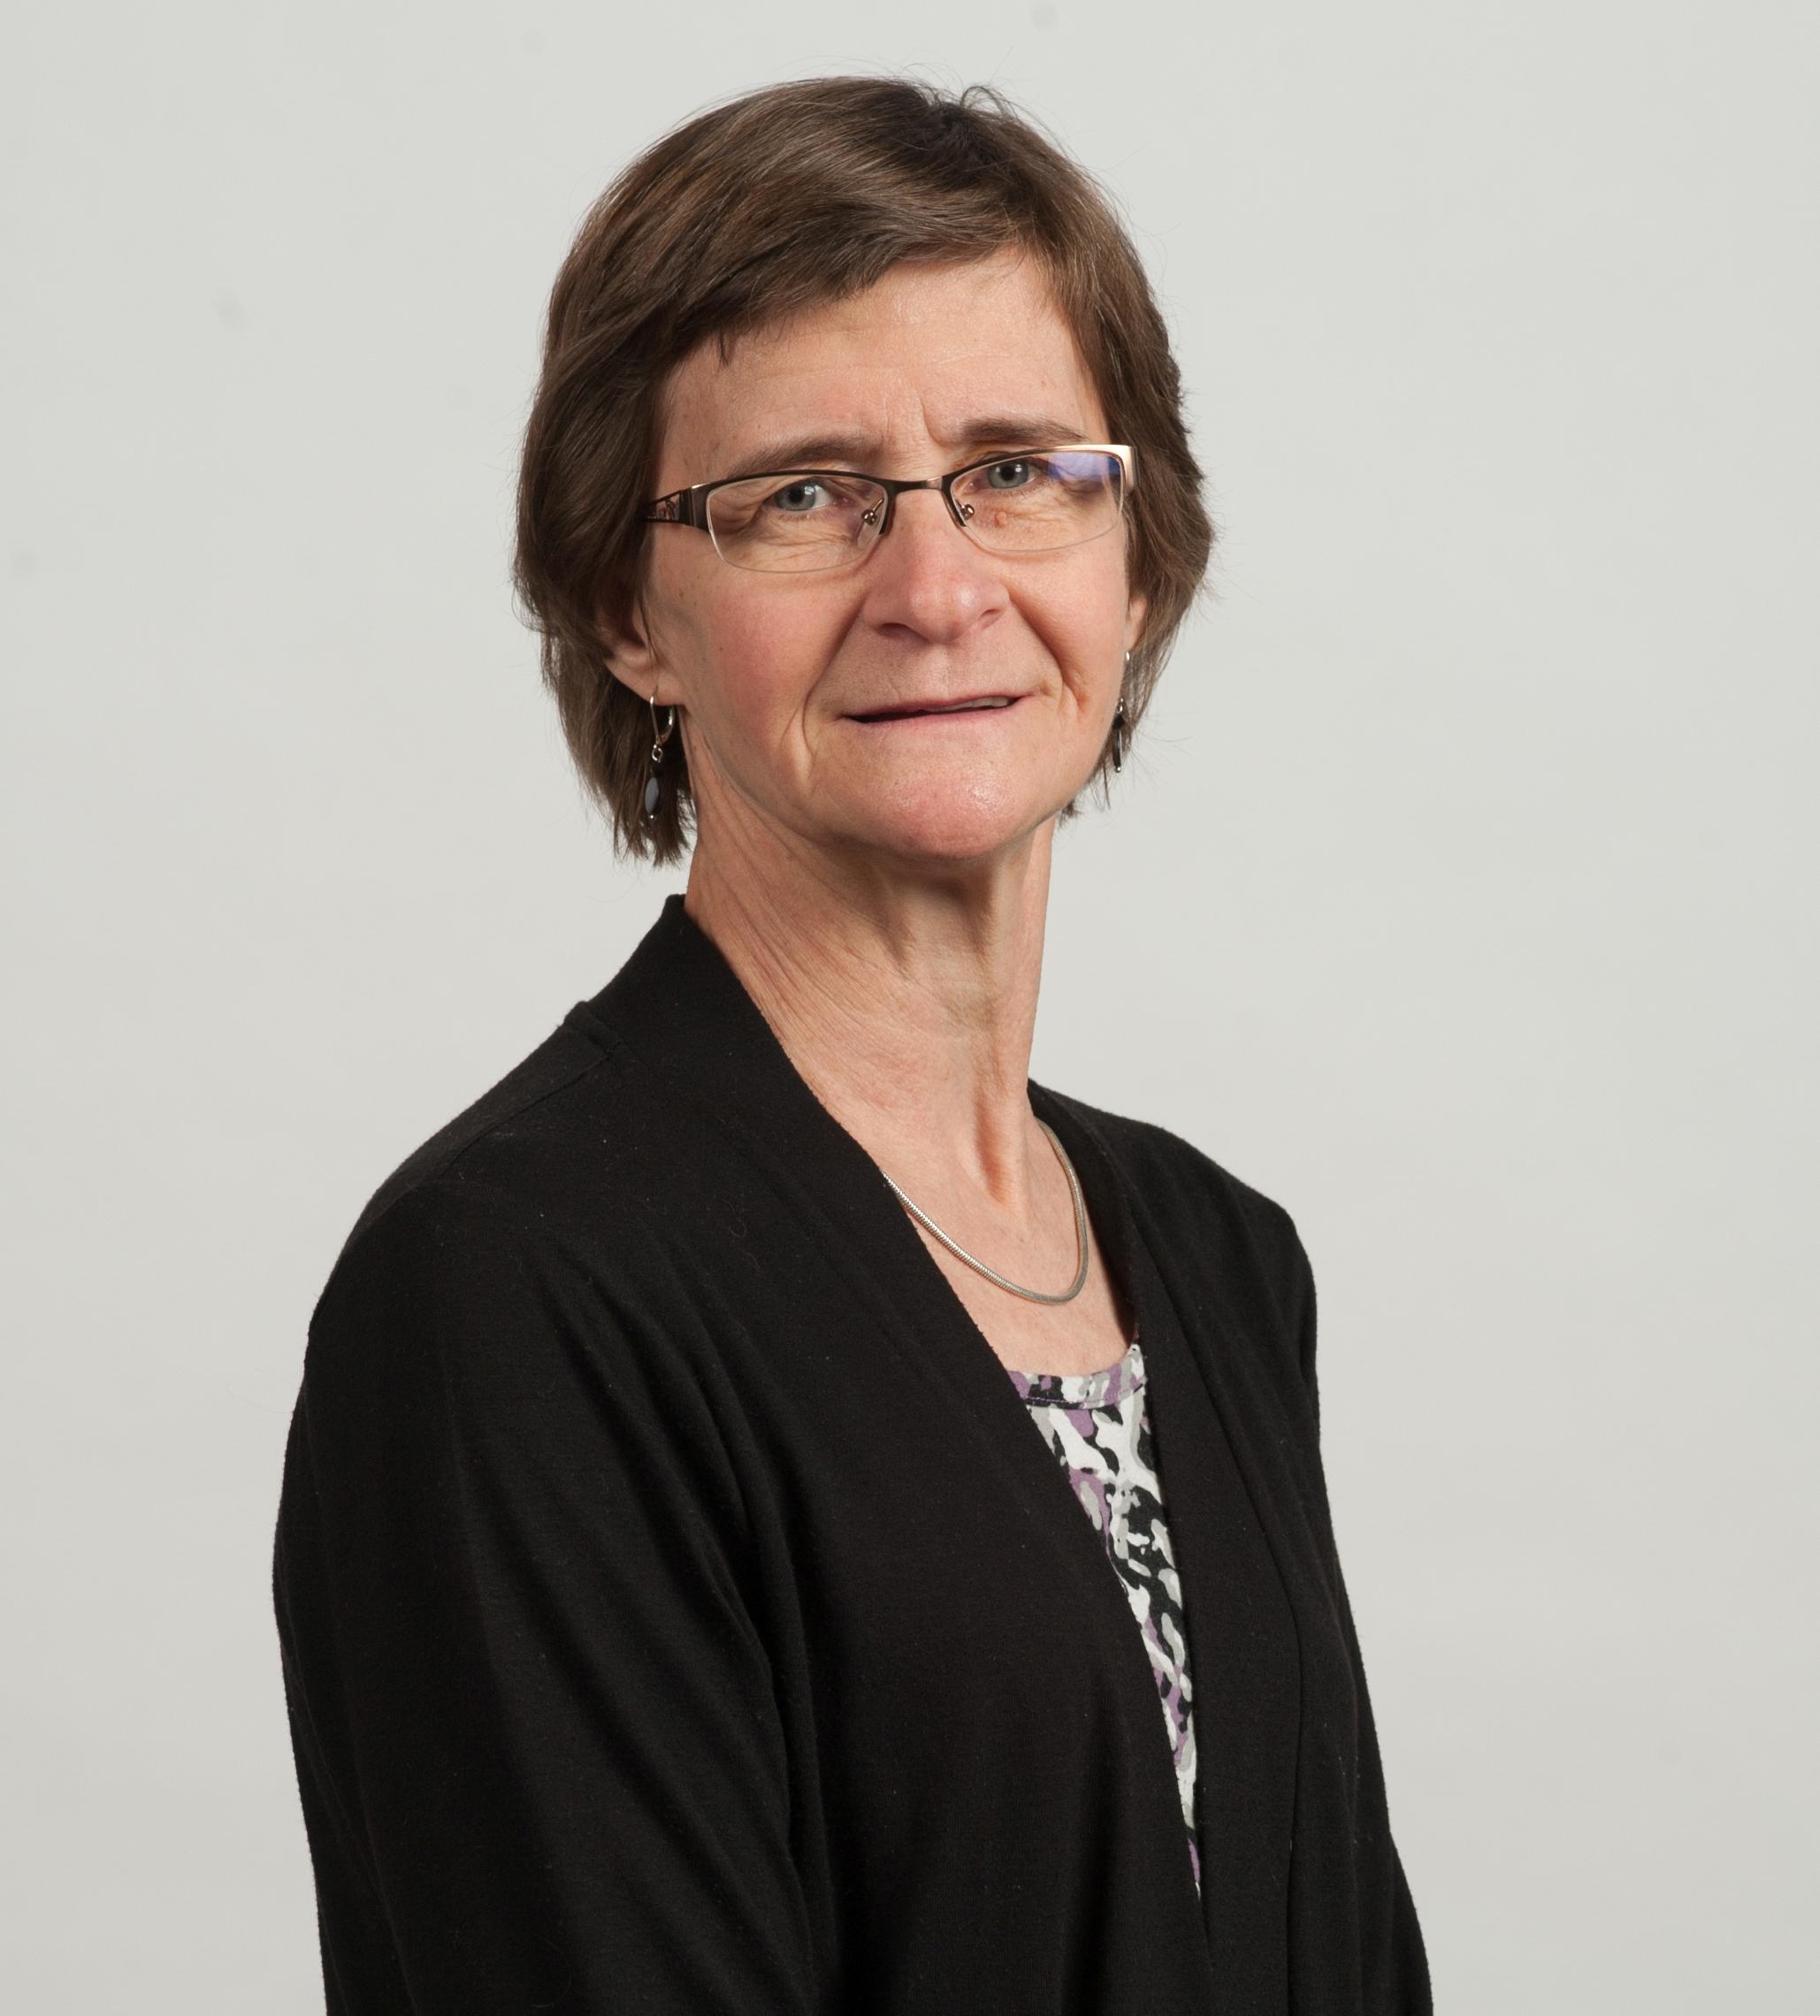 Barb Schenck. Photo courtesy of MorganMyers